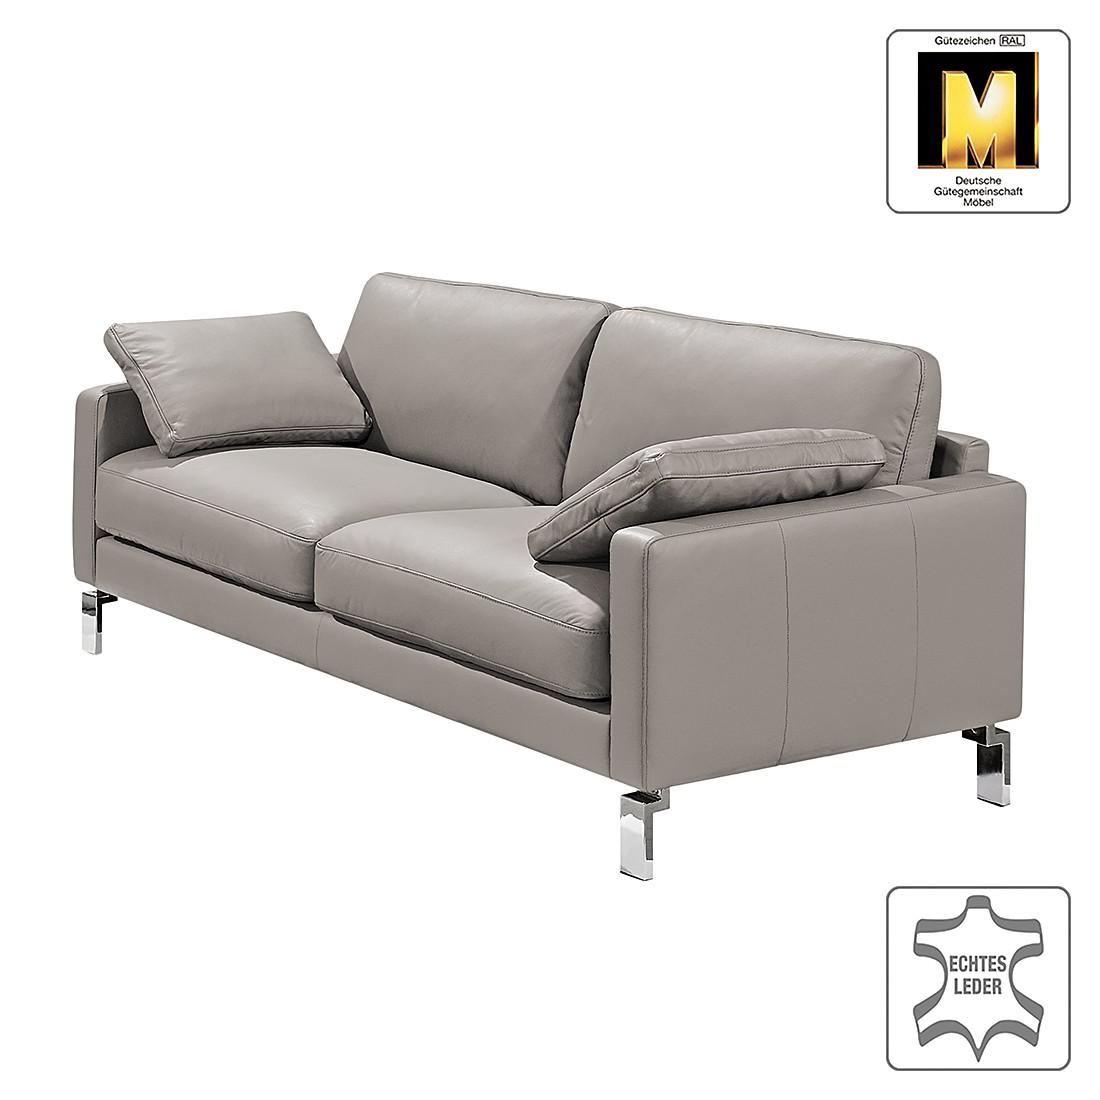 Sofa Casual Line IV (3-Sitzer) - Echtleder - Hellgrau - Gedecktes Leder, Claas Claasen